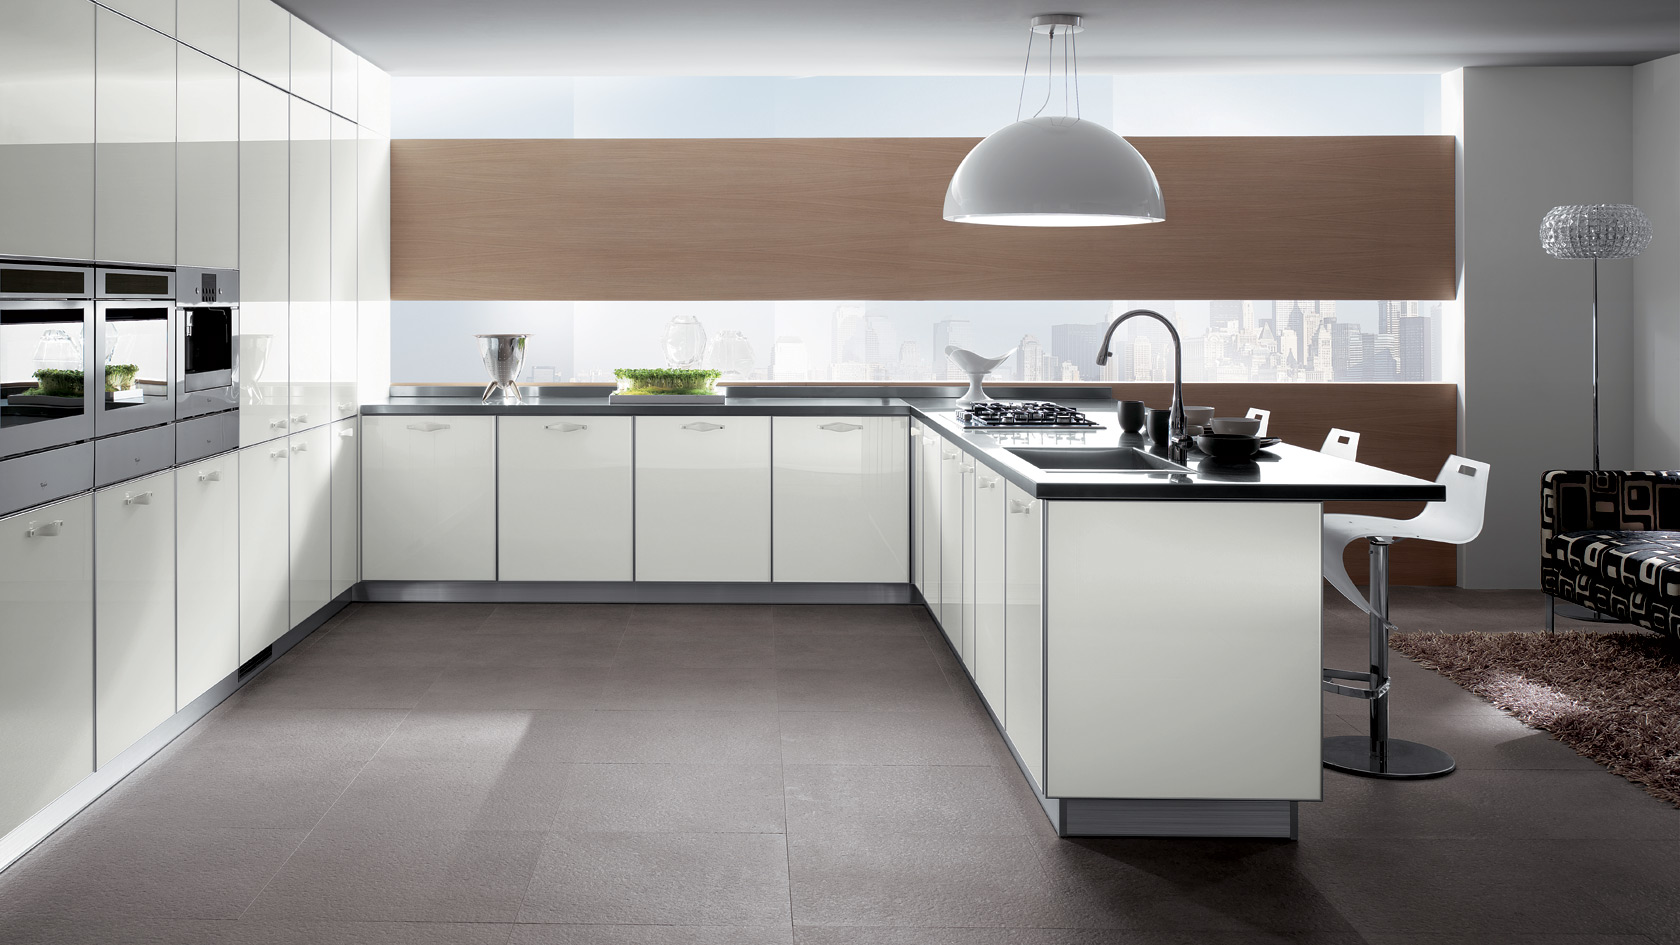 Kitchens: Crystal - See Materials